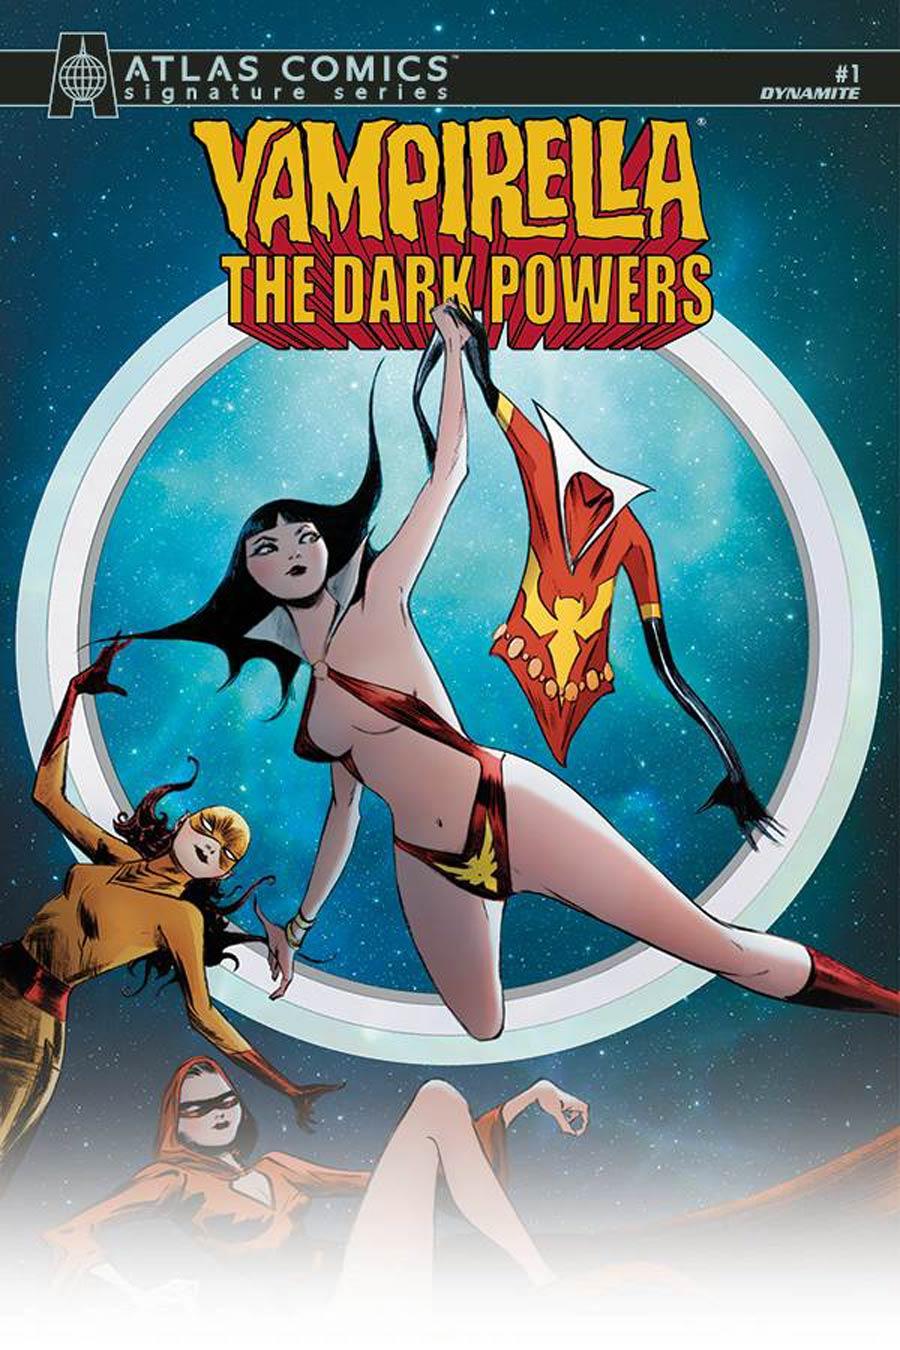 Vampirella The Dark Powers #1 Cover Z-E Atlas Comics Signature Series Signed By Jae Lee